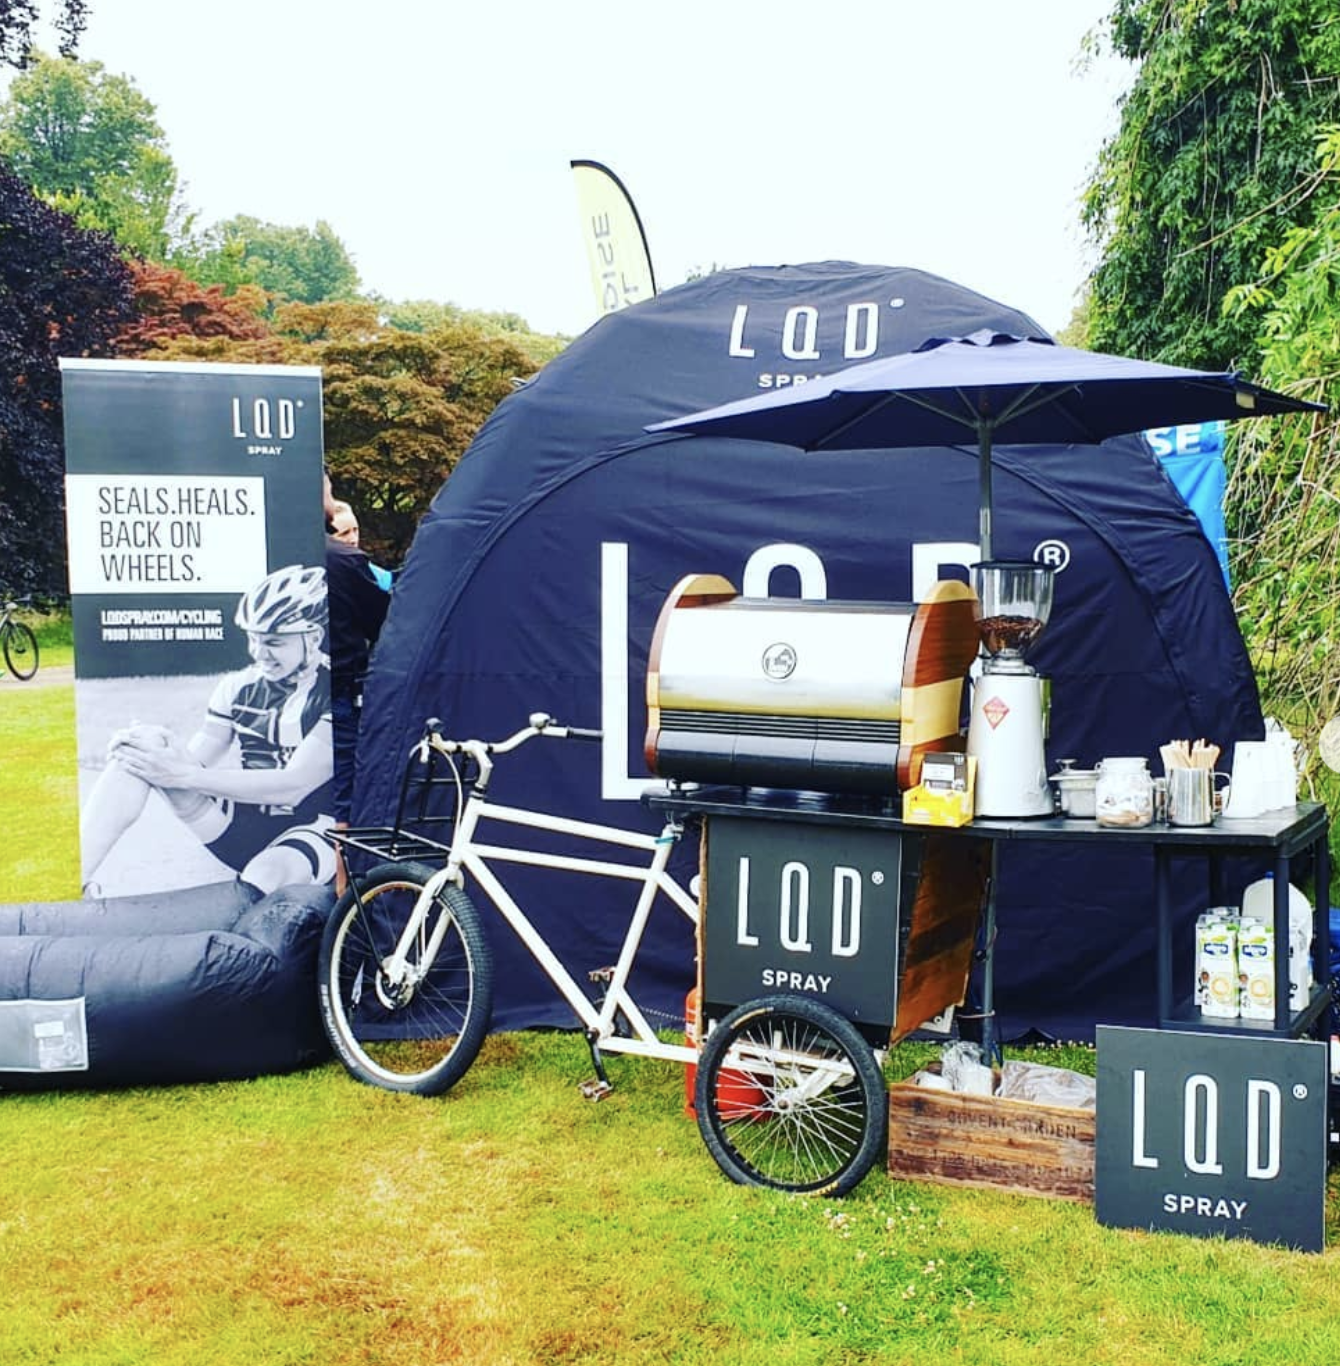 LQD Branding on Trike handlebar barista